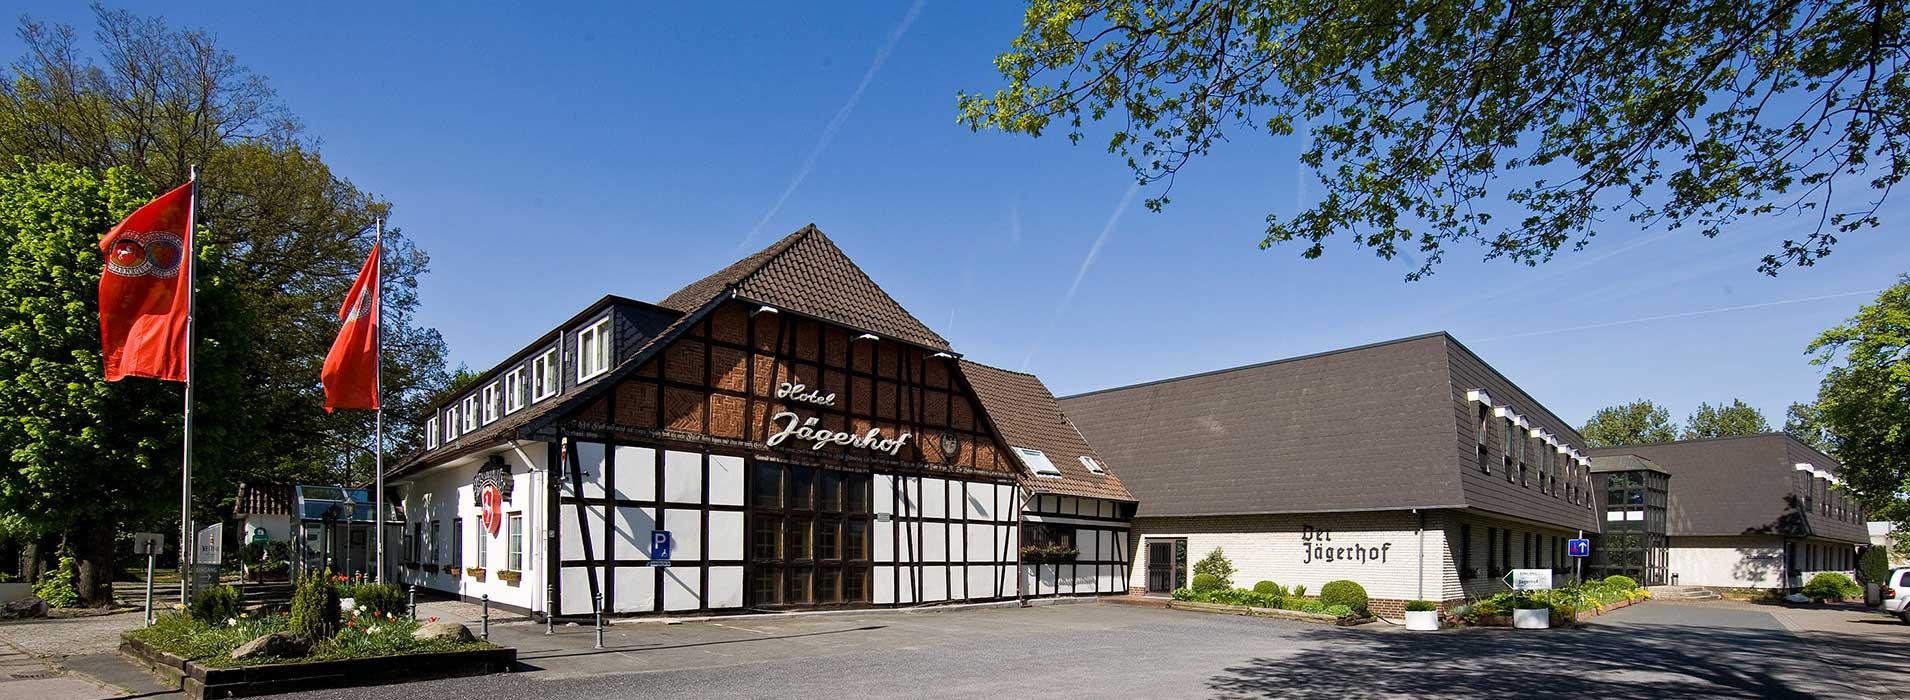 4-Sterne Hotel Jägerhof Hannover Langenhagen